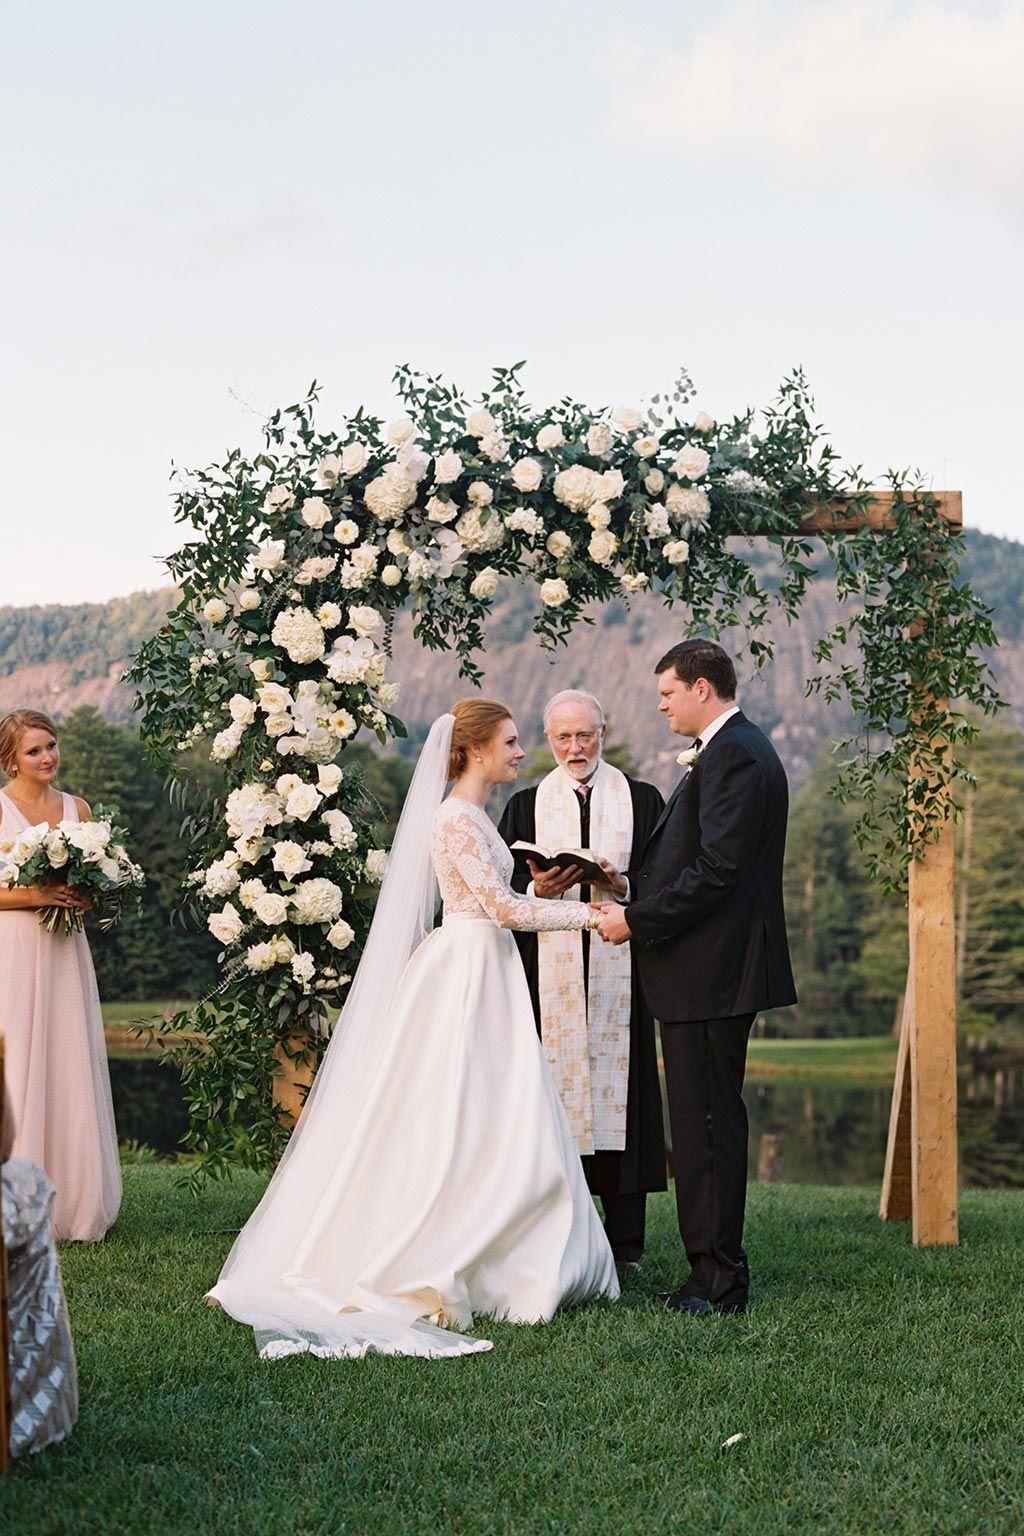 High Hampton Inn Resort Wedding North Carolina Wedding Florist Floressence Flowers North Carolina Wedding Ivory Wedding Flowers White Wedding Flowers